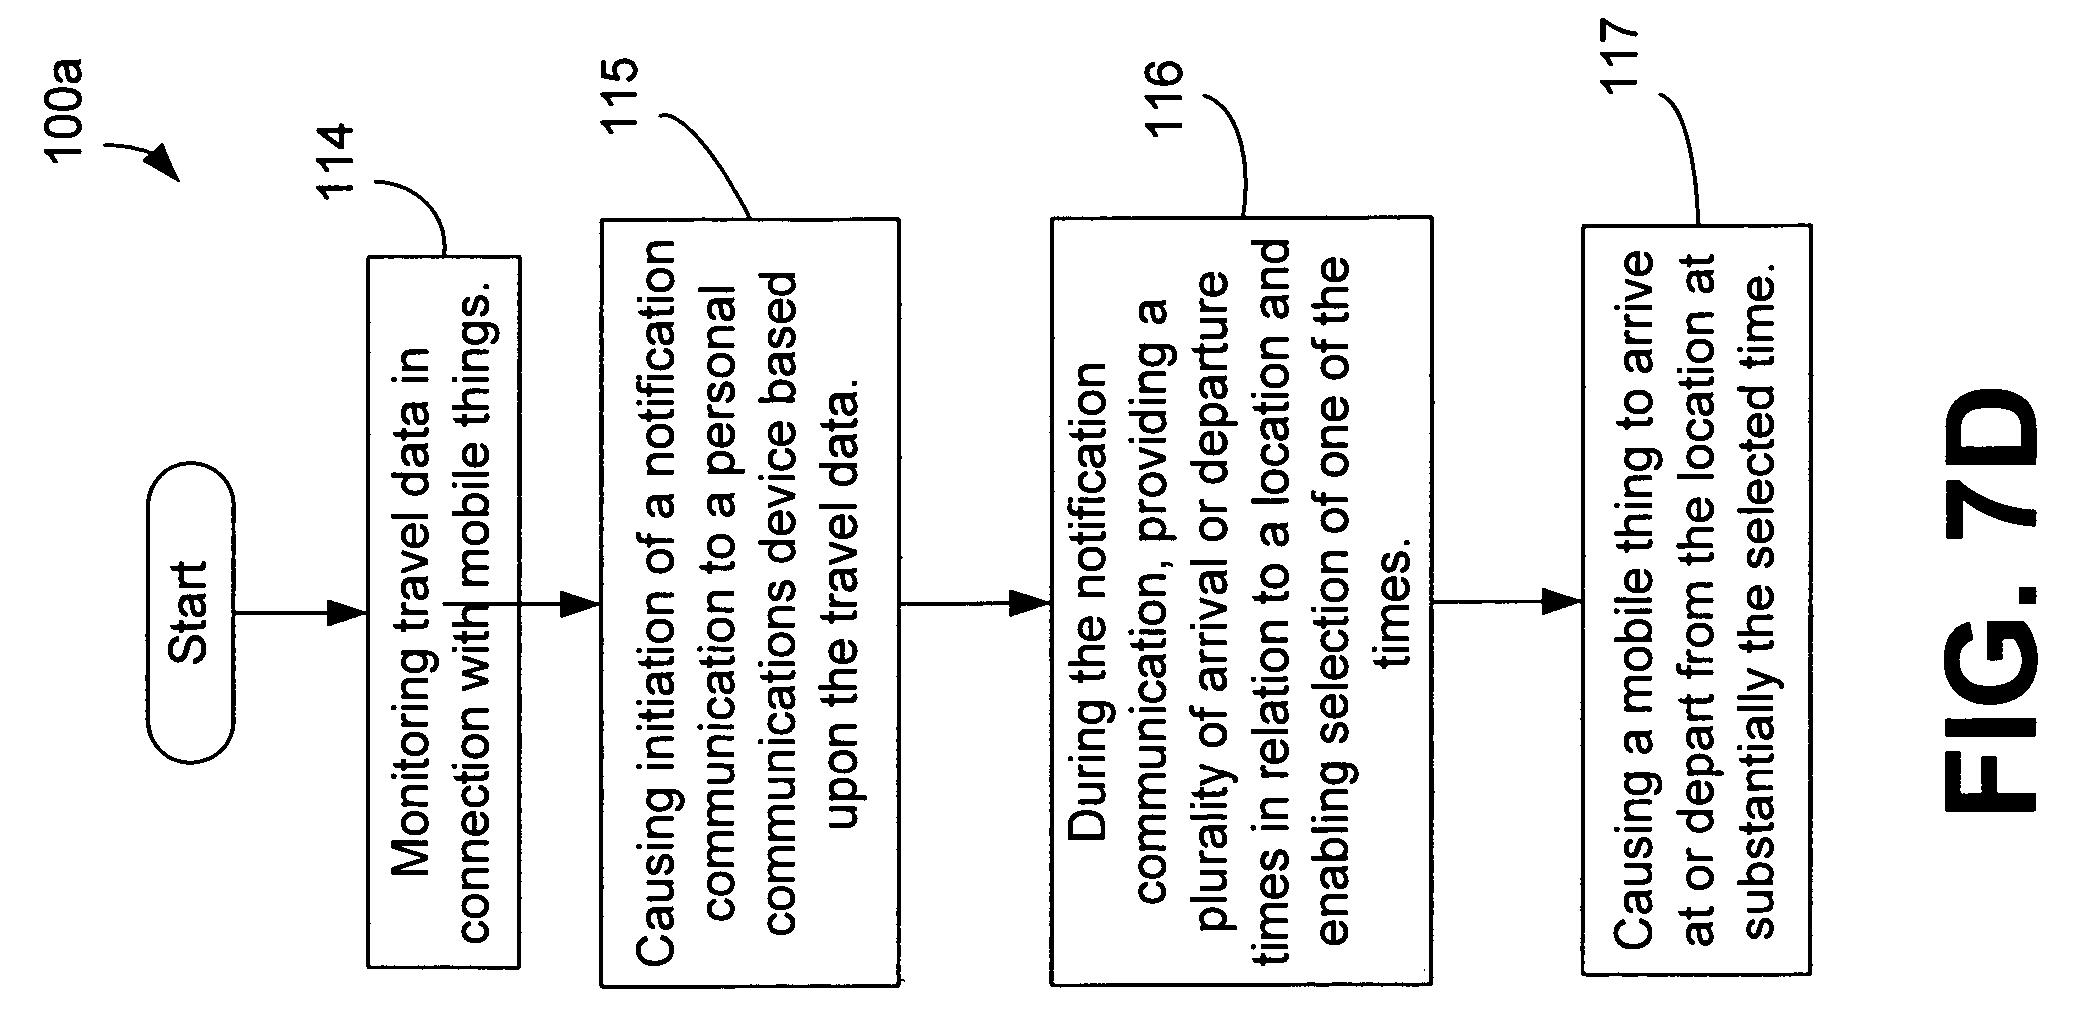 Patent US 7,479,900 B2